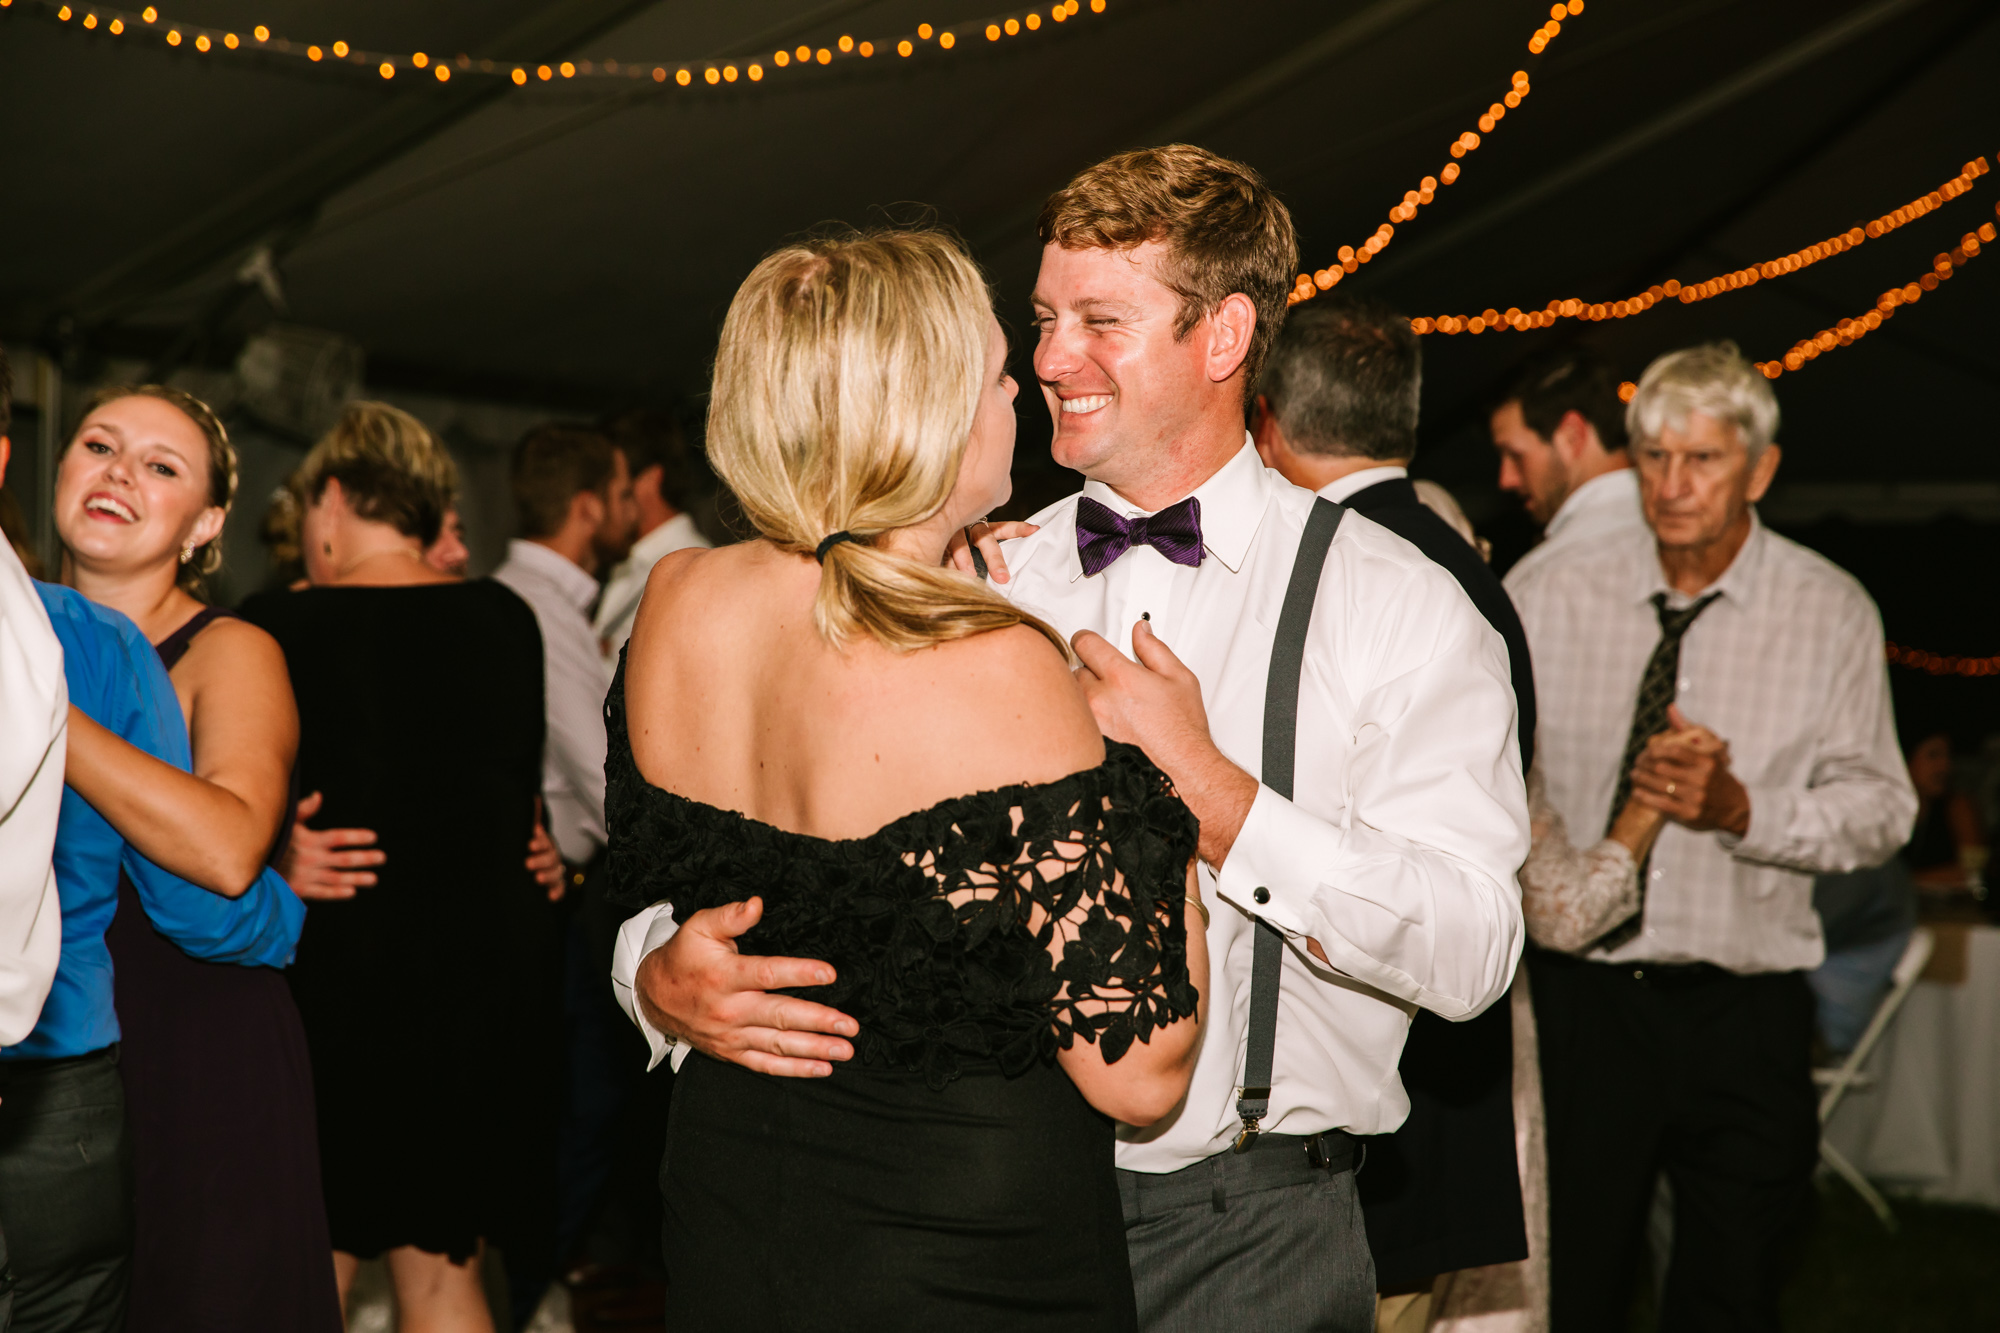 Waynesville, NC Wedding Photography | Wedding Reception Dancing and Smiling